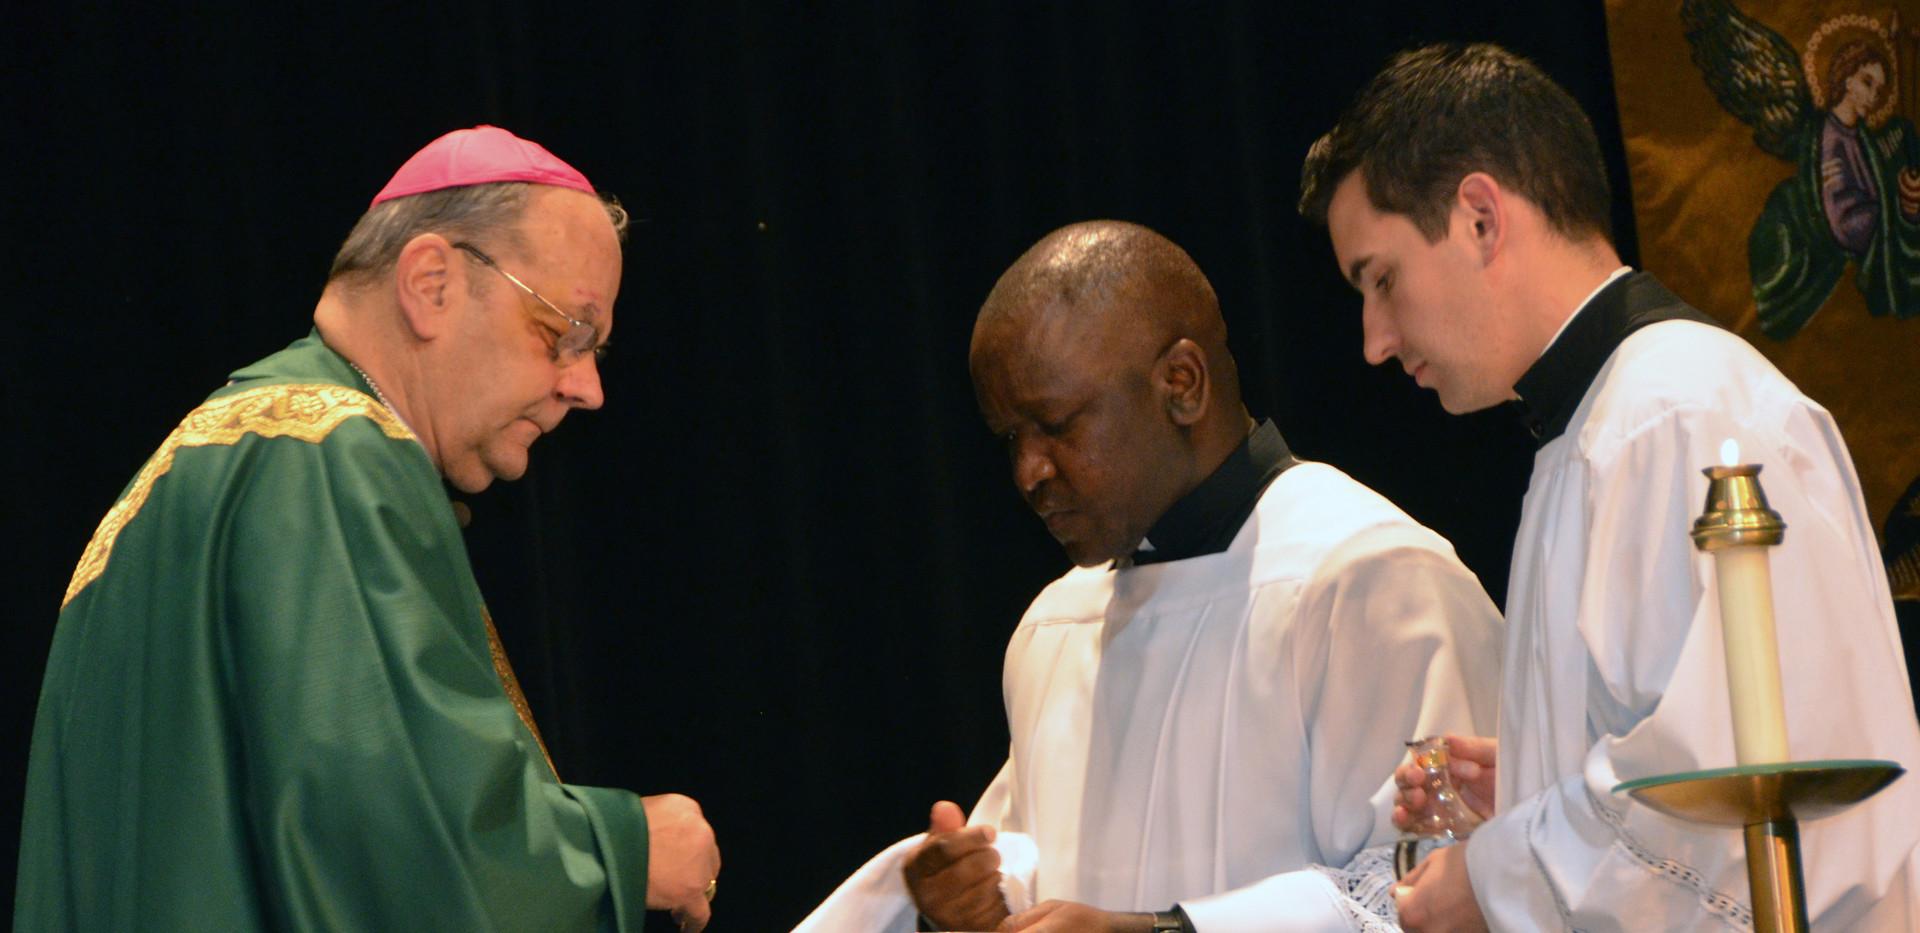 Priest Washing Hands.jpg